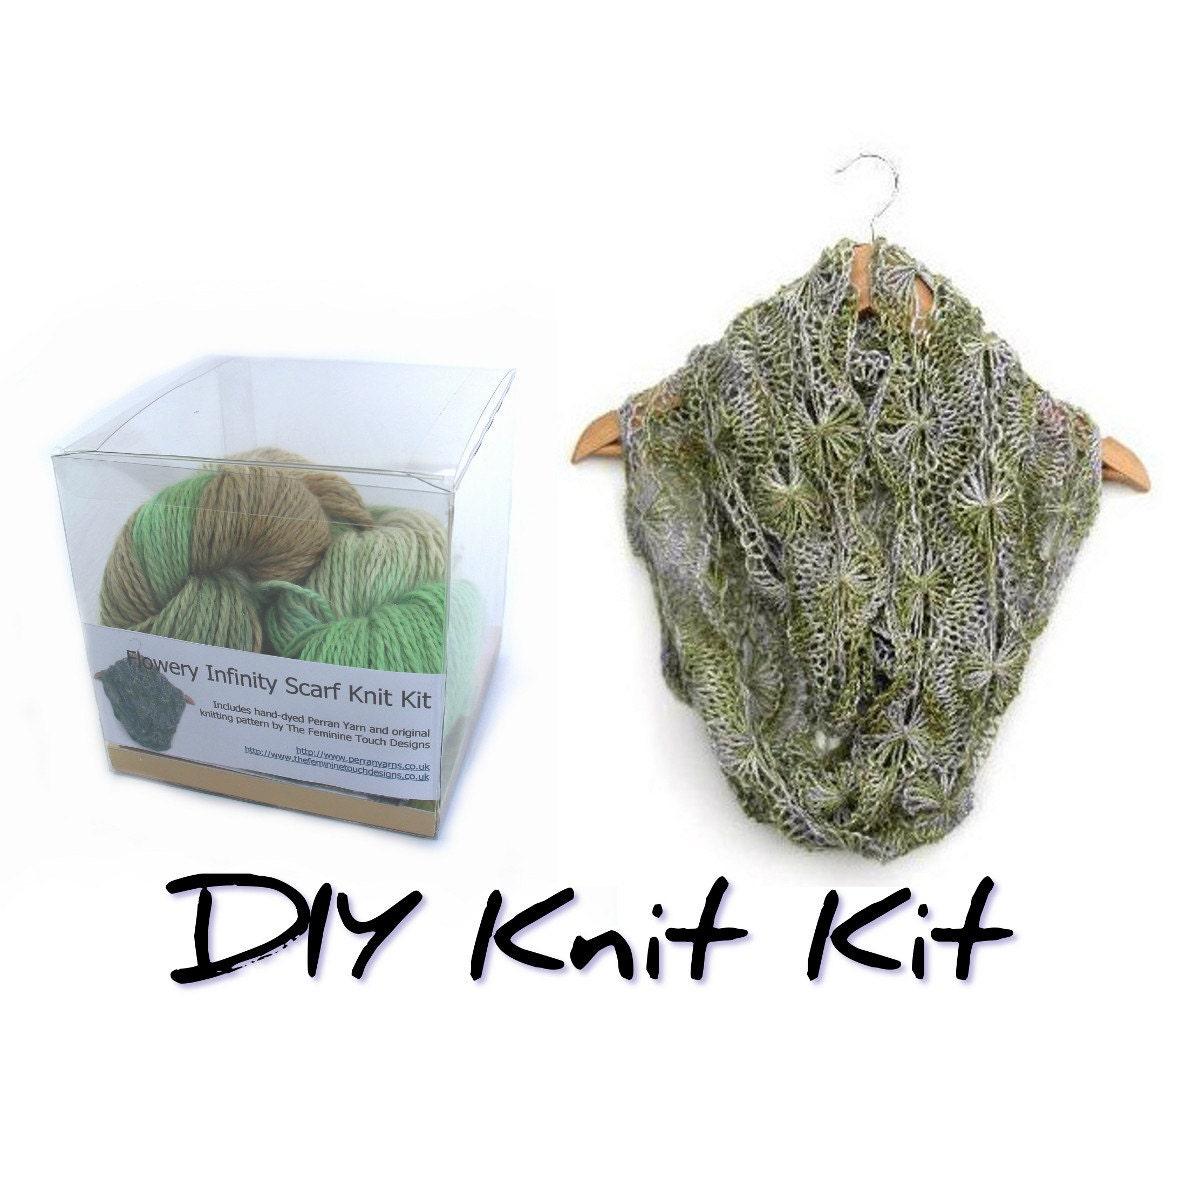 Scarf Knitting Kits Uk : Diy knit kit flowery infinity scarf knitting easy